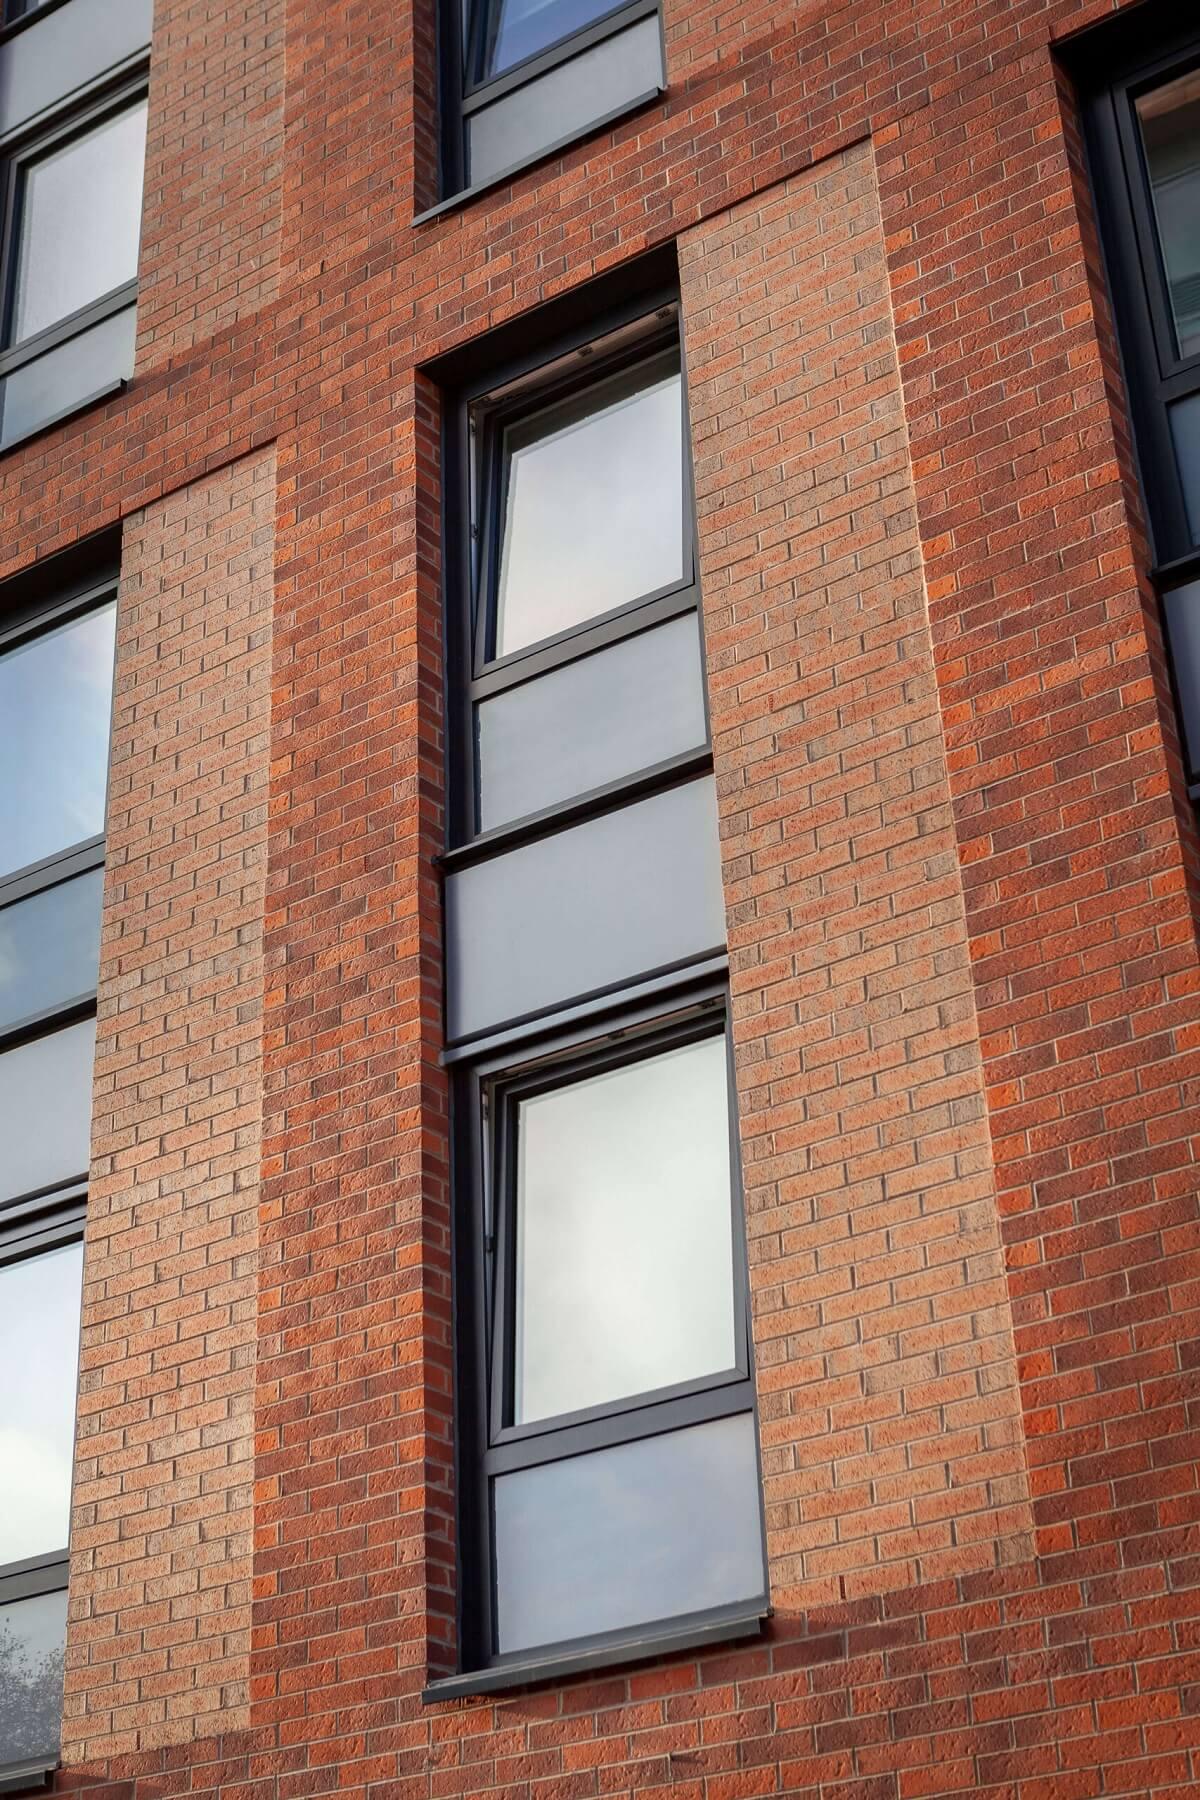 Tilt and turn windows on a block of flats